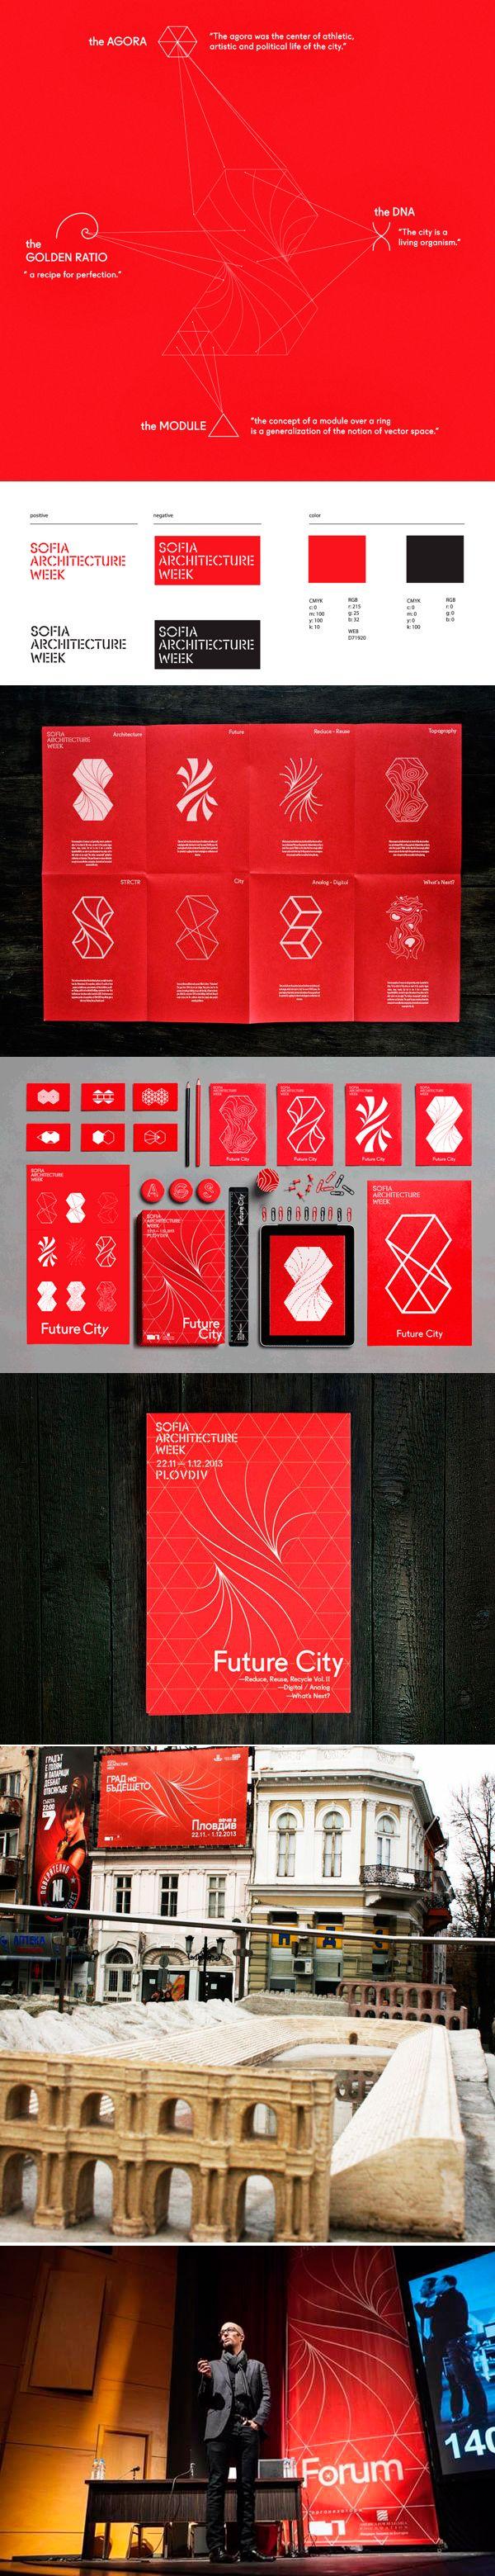 identity / Sofia Architecture Week 2014 http://www.arcreactions.com/calgary-marketing-blog/